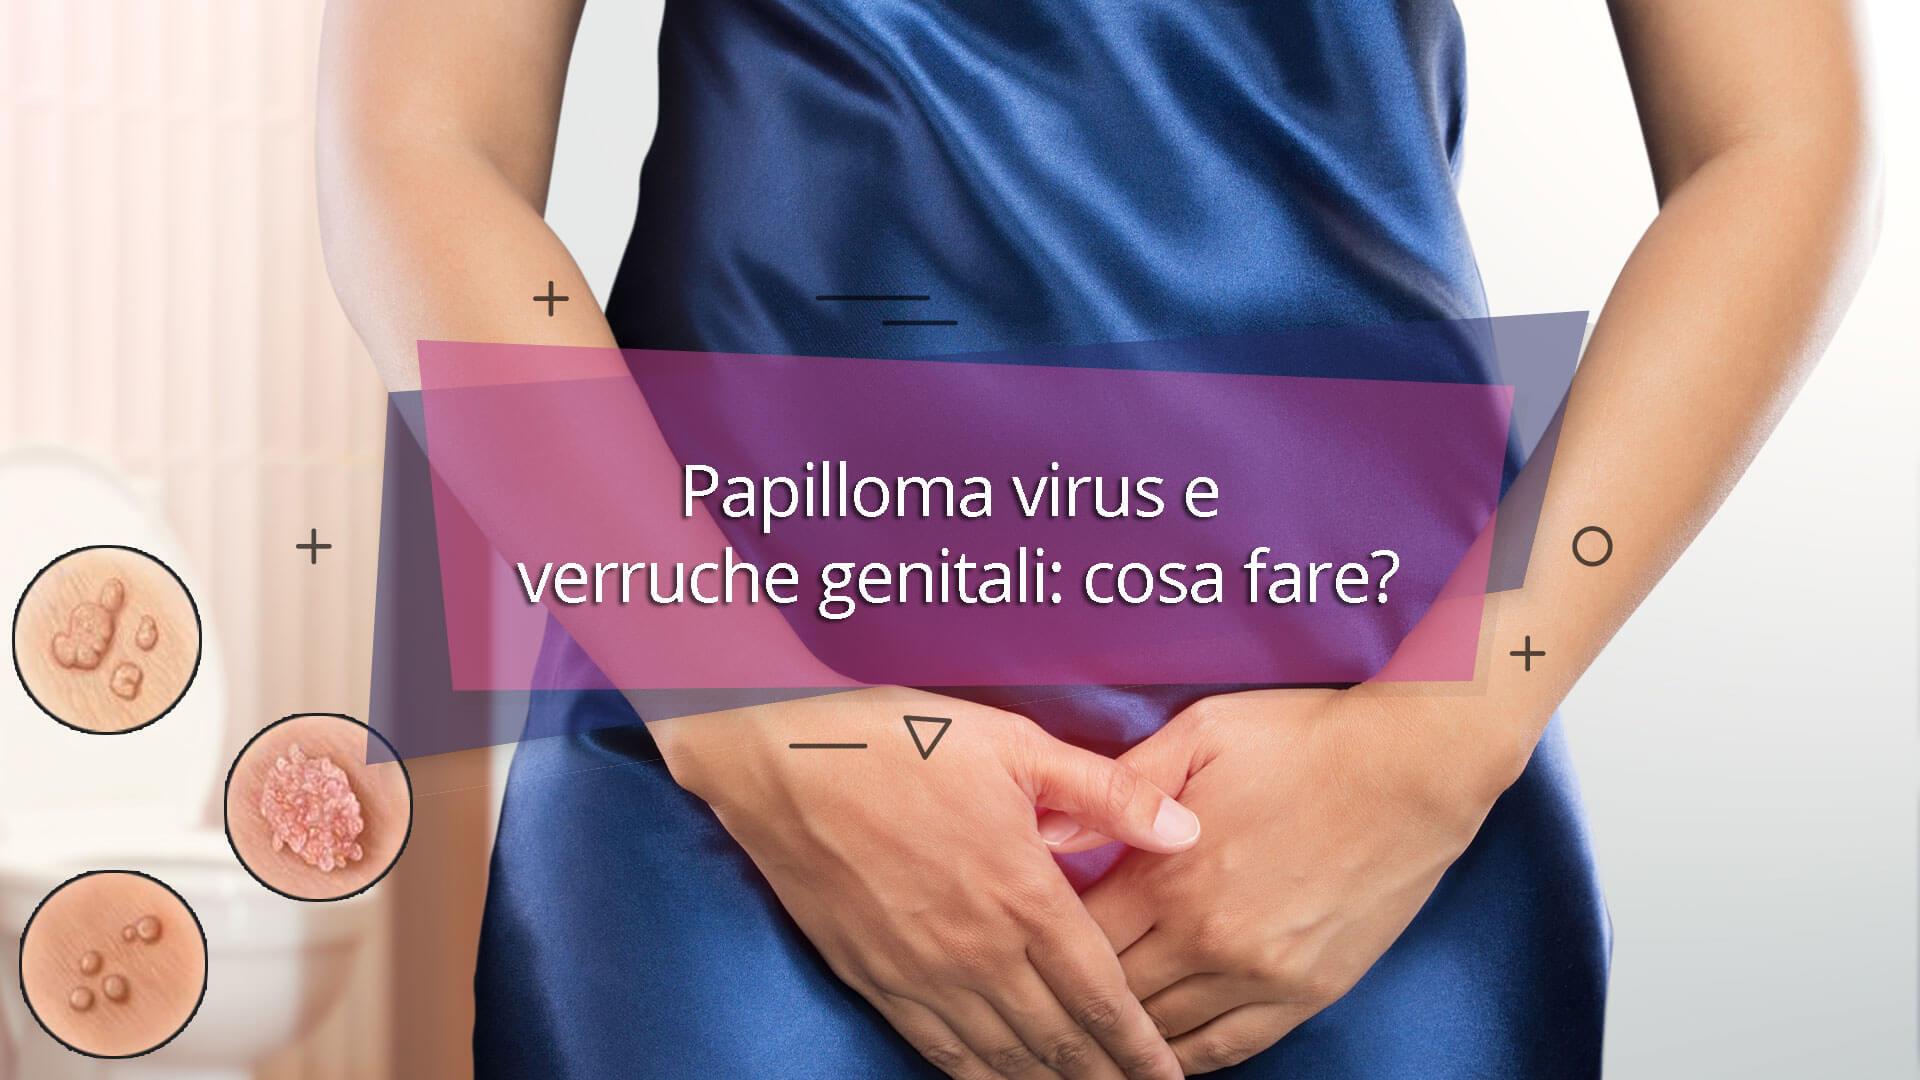 Papilloma grandi labbra. How do you get human papillomavirus